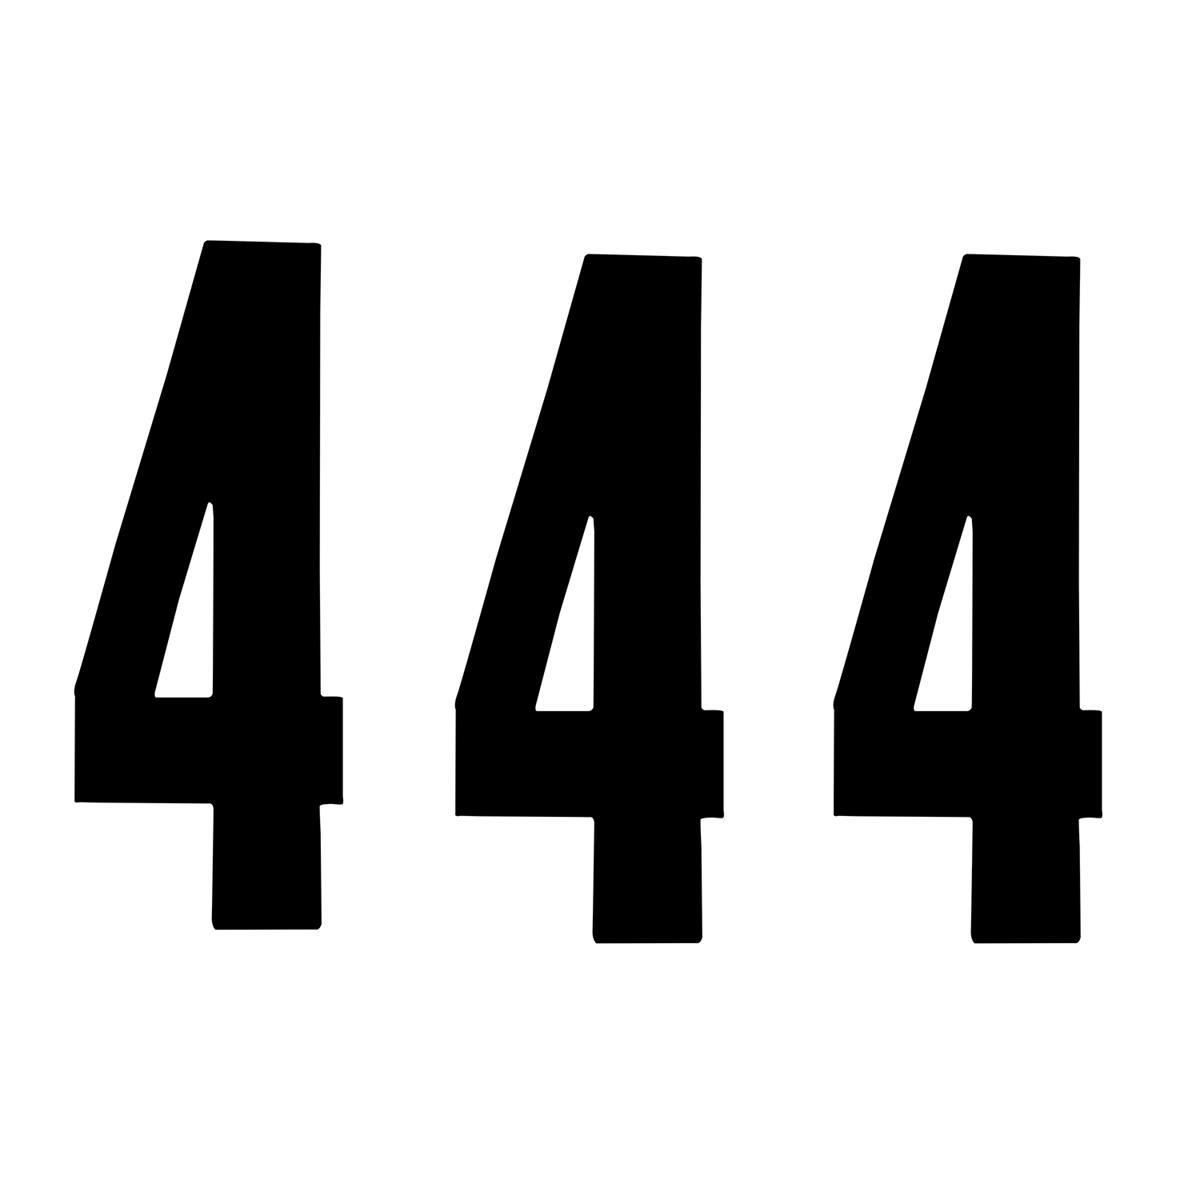 ZAP Startnummer-Set Racing Nummer 4, Schwarz, 17 cm, 3 Stück